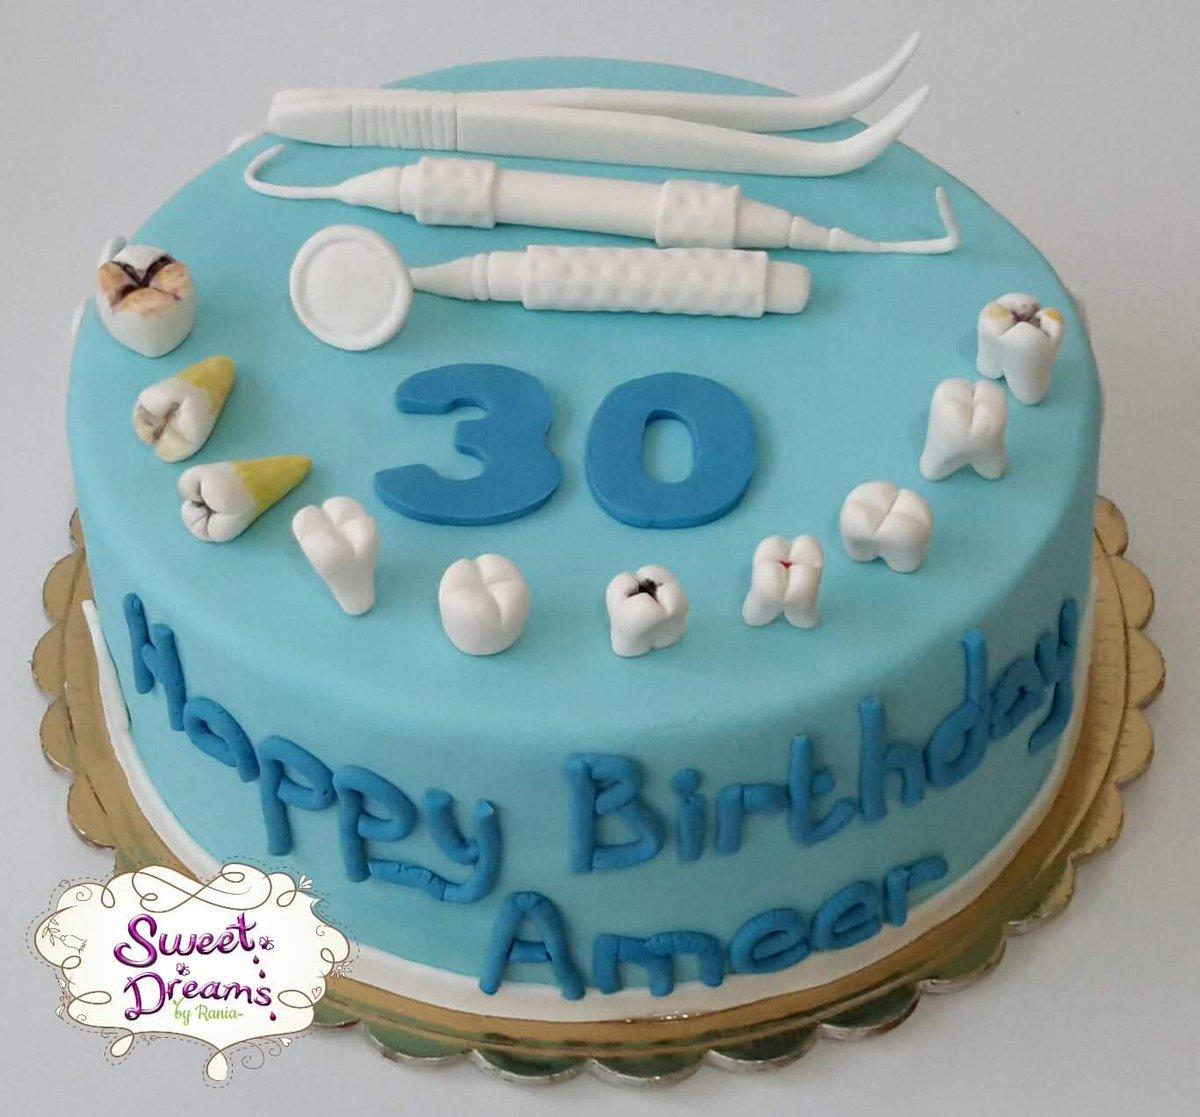 Sweet Dreams Byrania On Twitter Dentist Cake Sweetdreamsbyrania